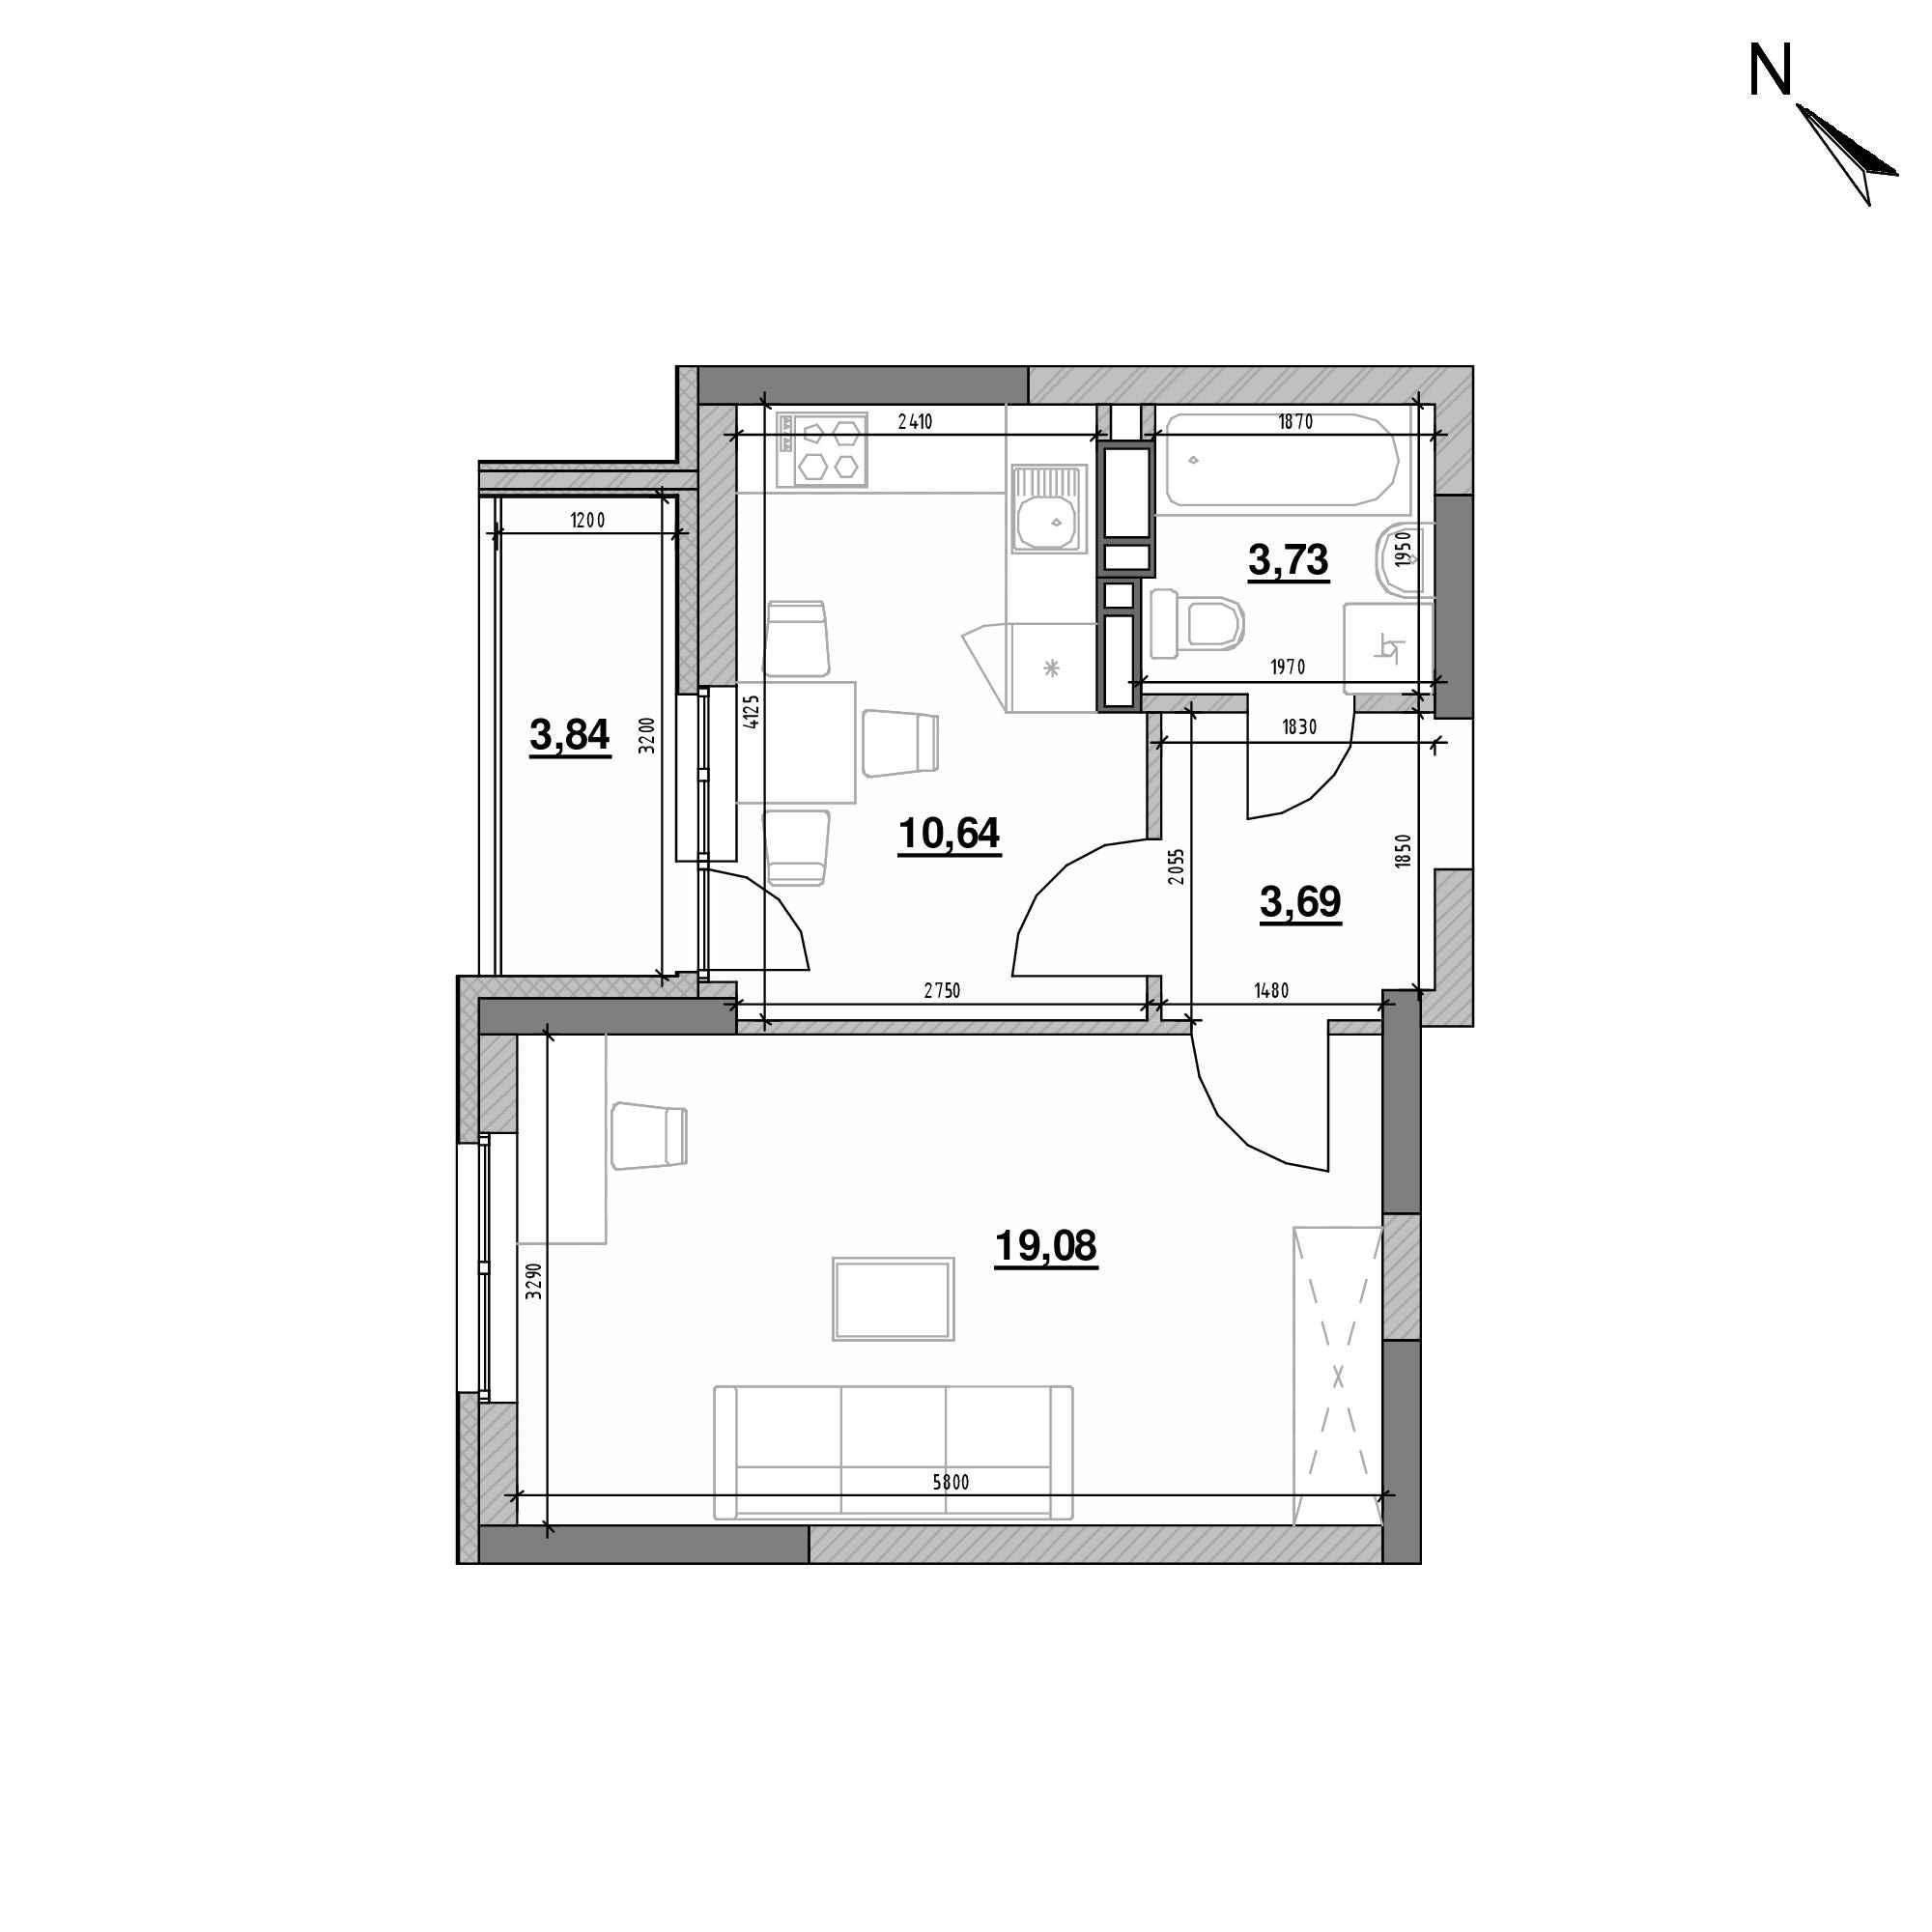 ЖК Оk'Land: планування 1-кімнатної квартири, №227, 40.98 м<sup>2</sup>